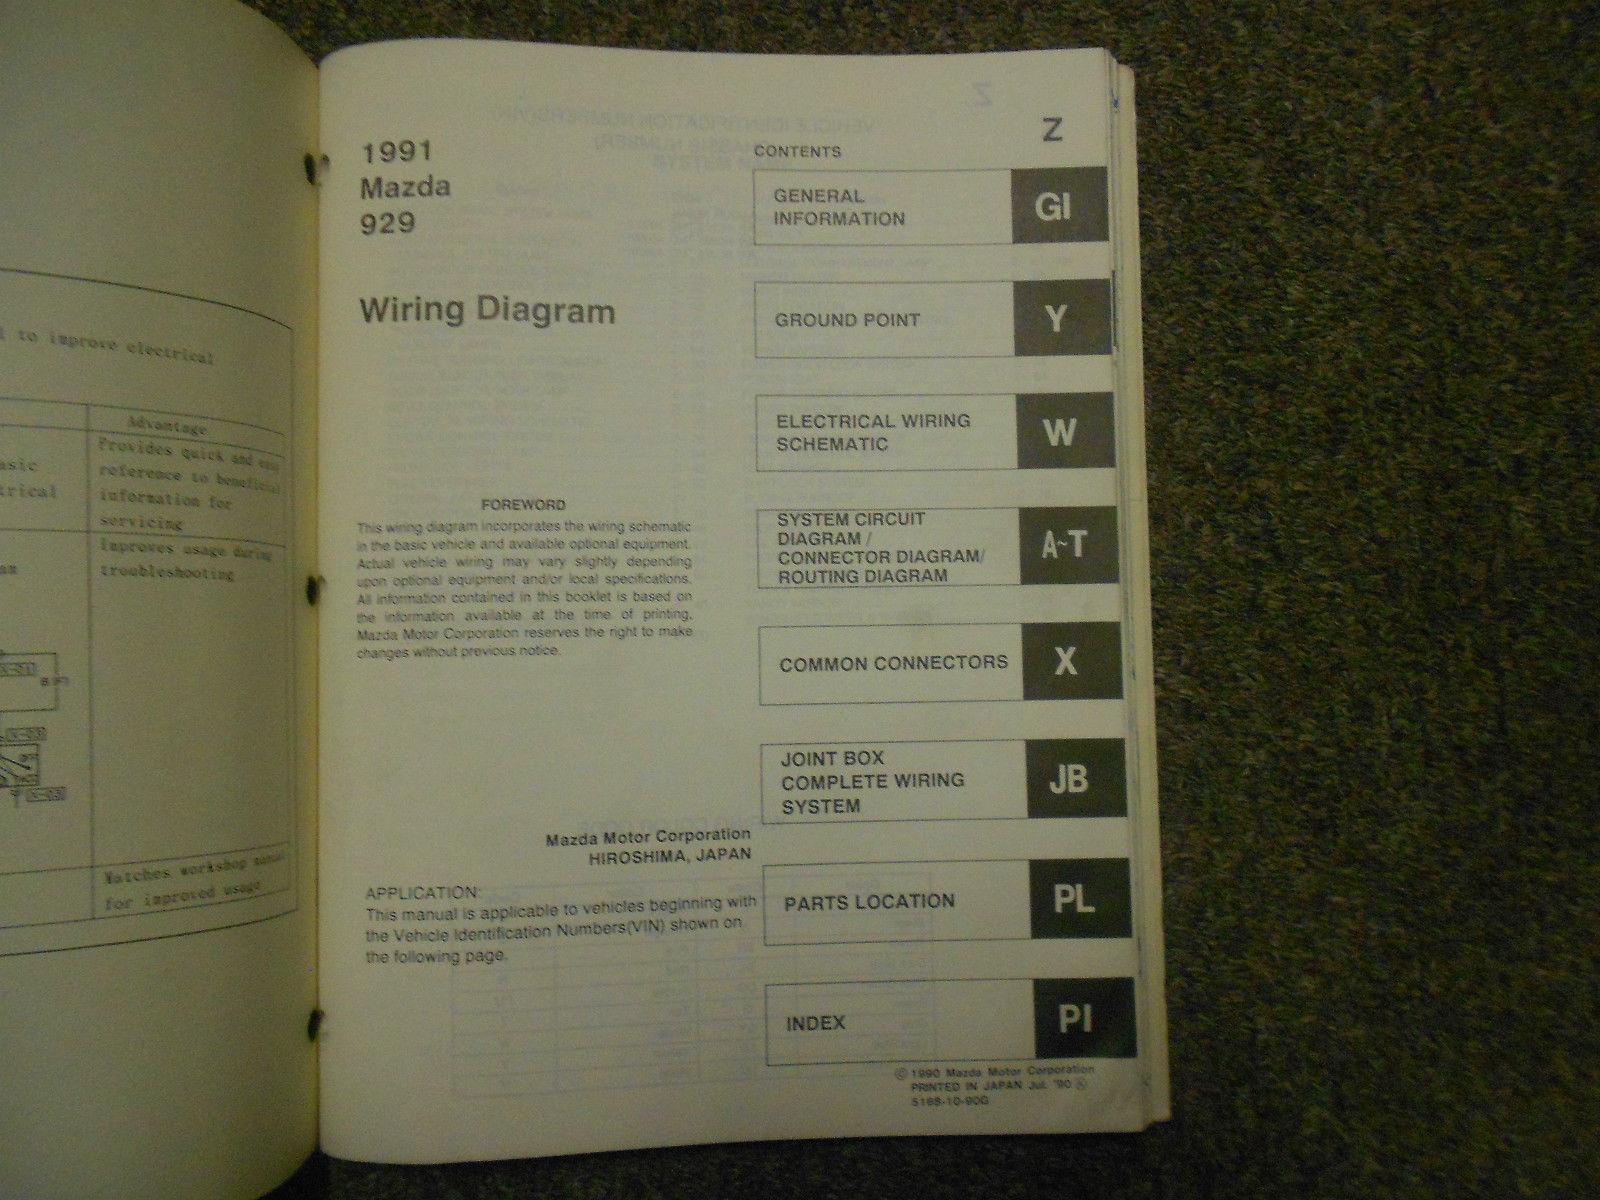 1991 Mazda 929 Electrical Wiring Diagram And 50 Similar Items